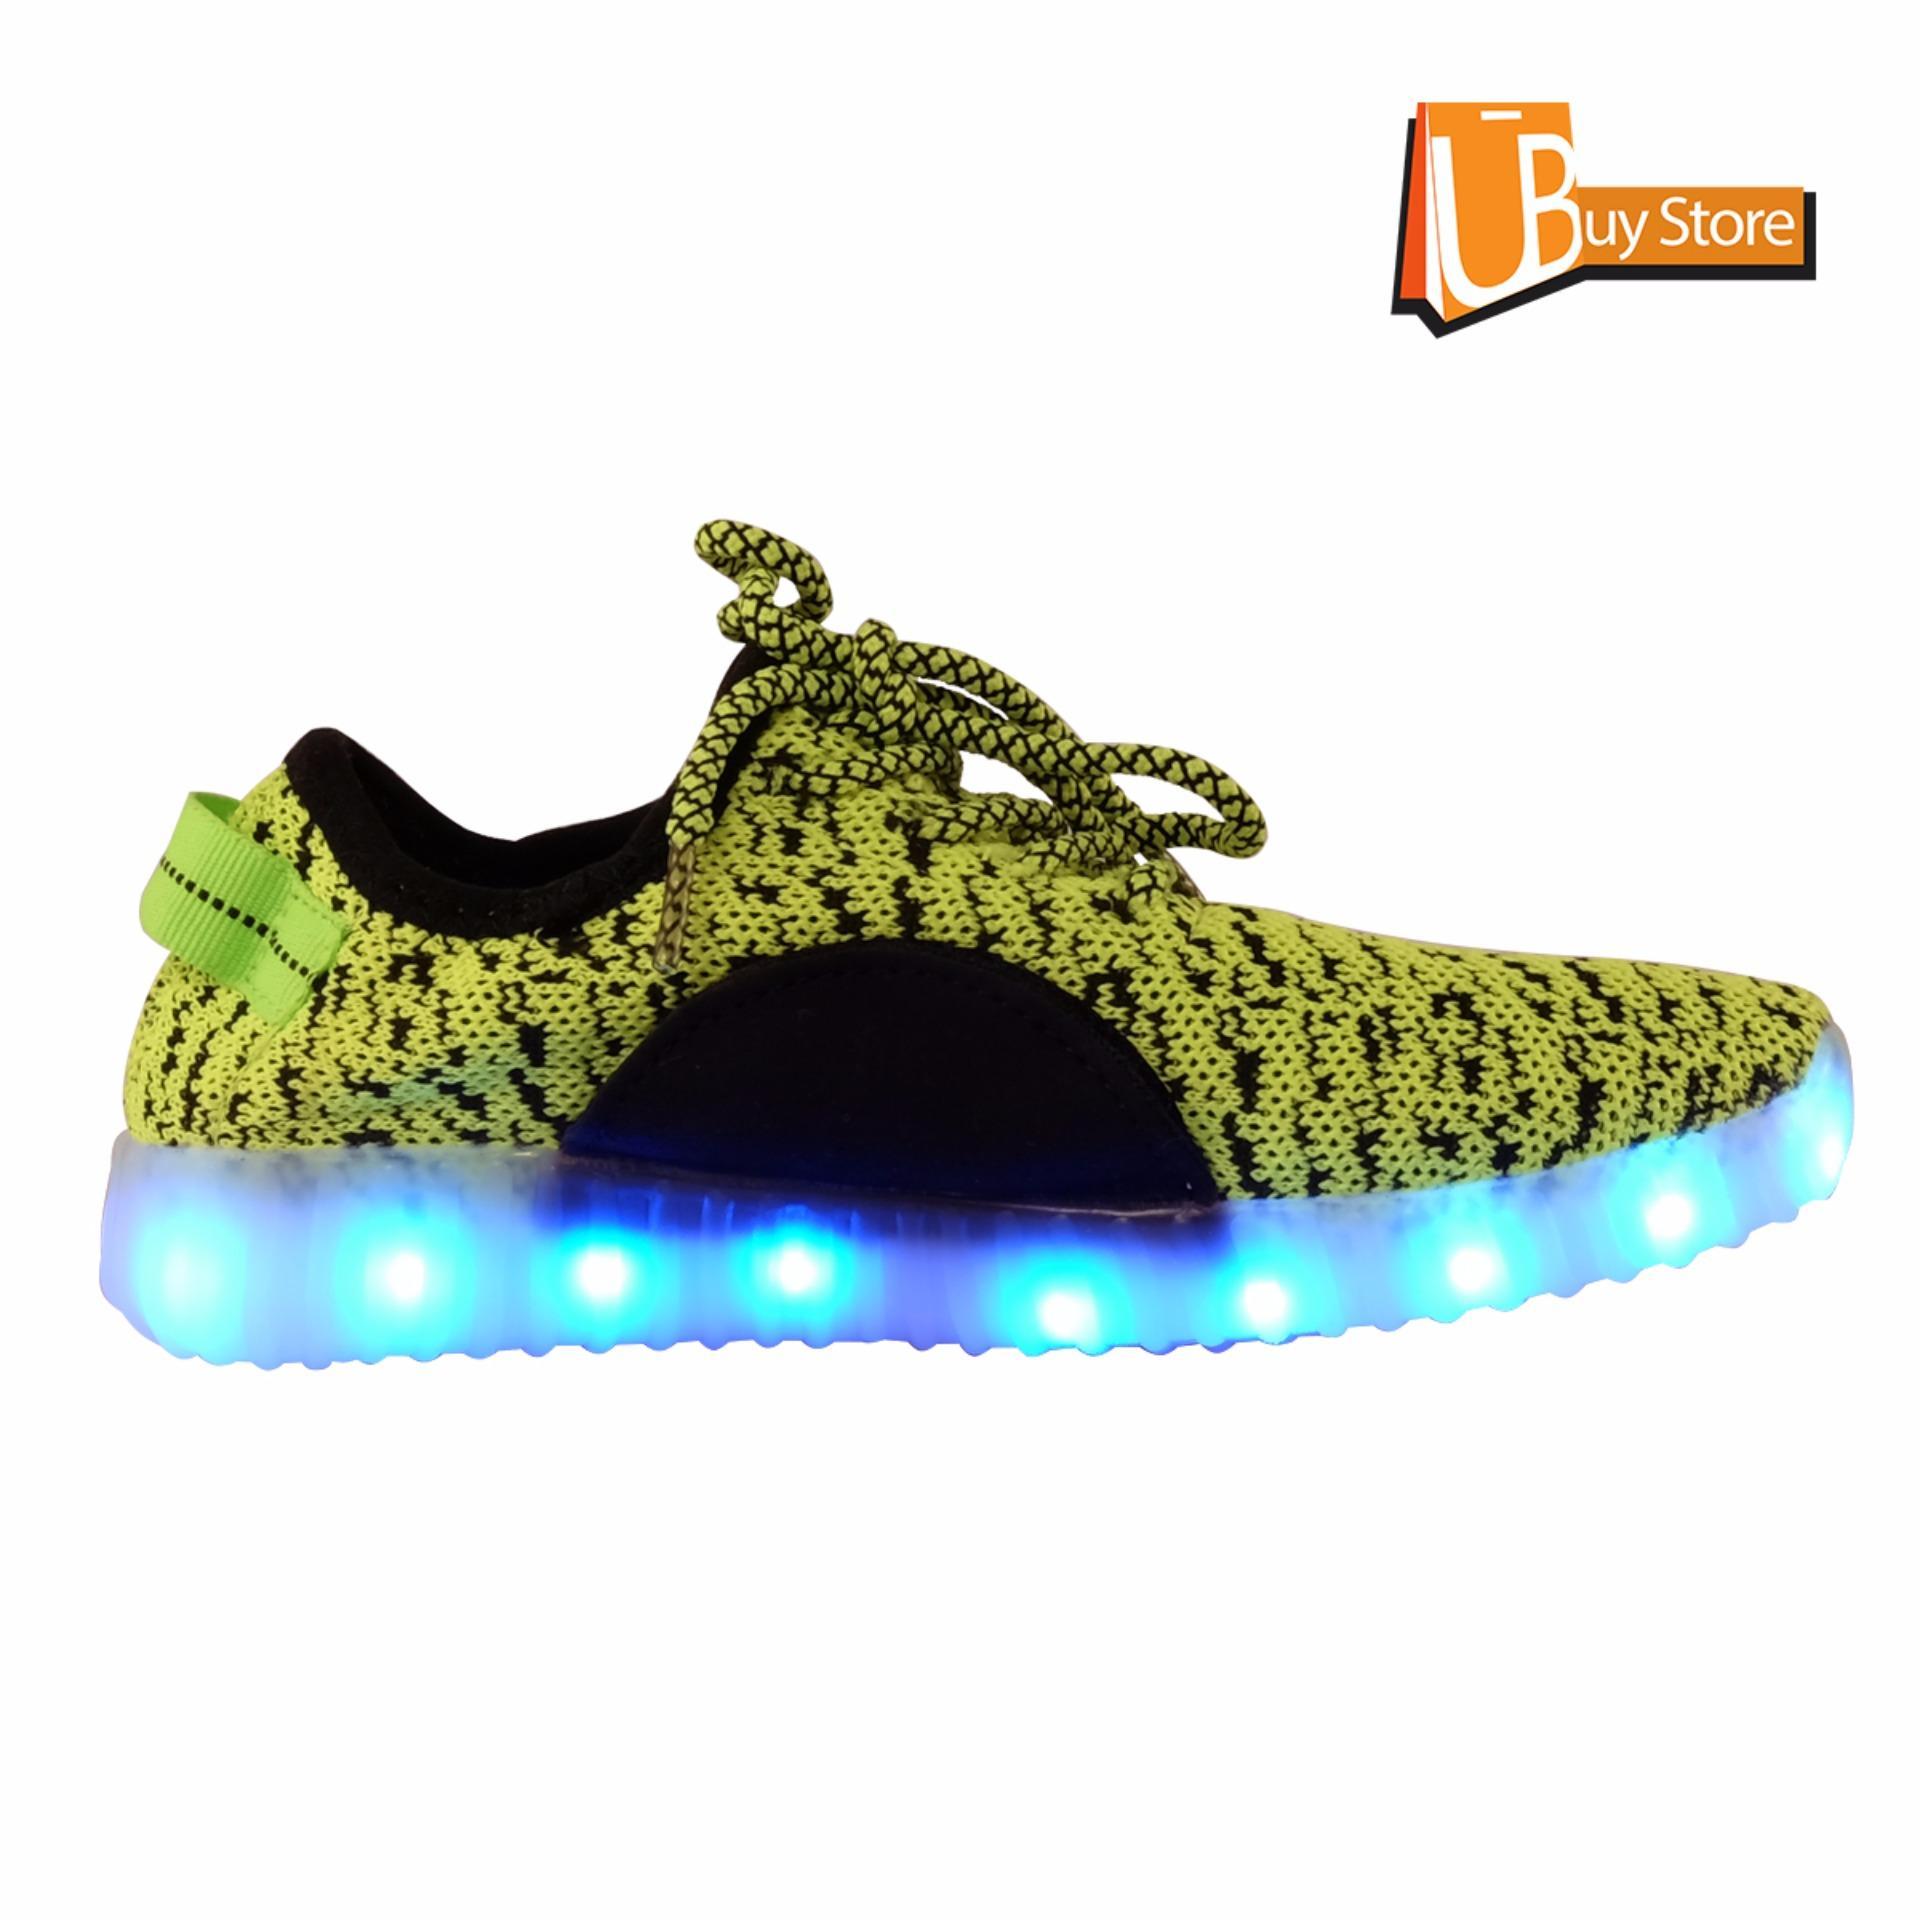 Ubuy Anak-anak Anak Laki-Laki Perempuan Menjalankan sepatu Sneakers  bercahaya . 3148104a28